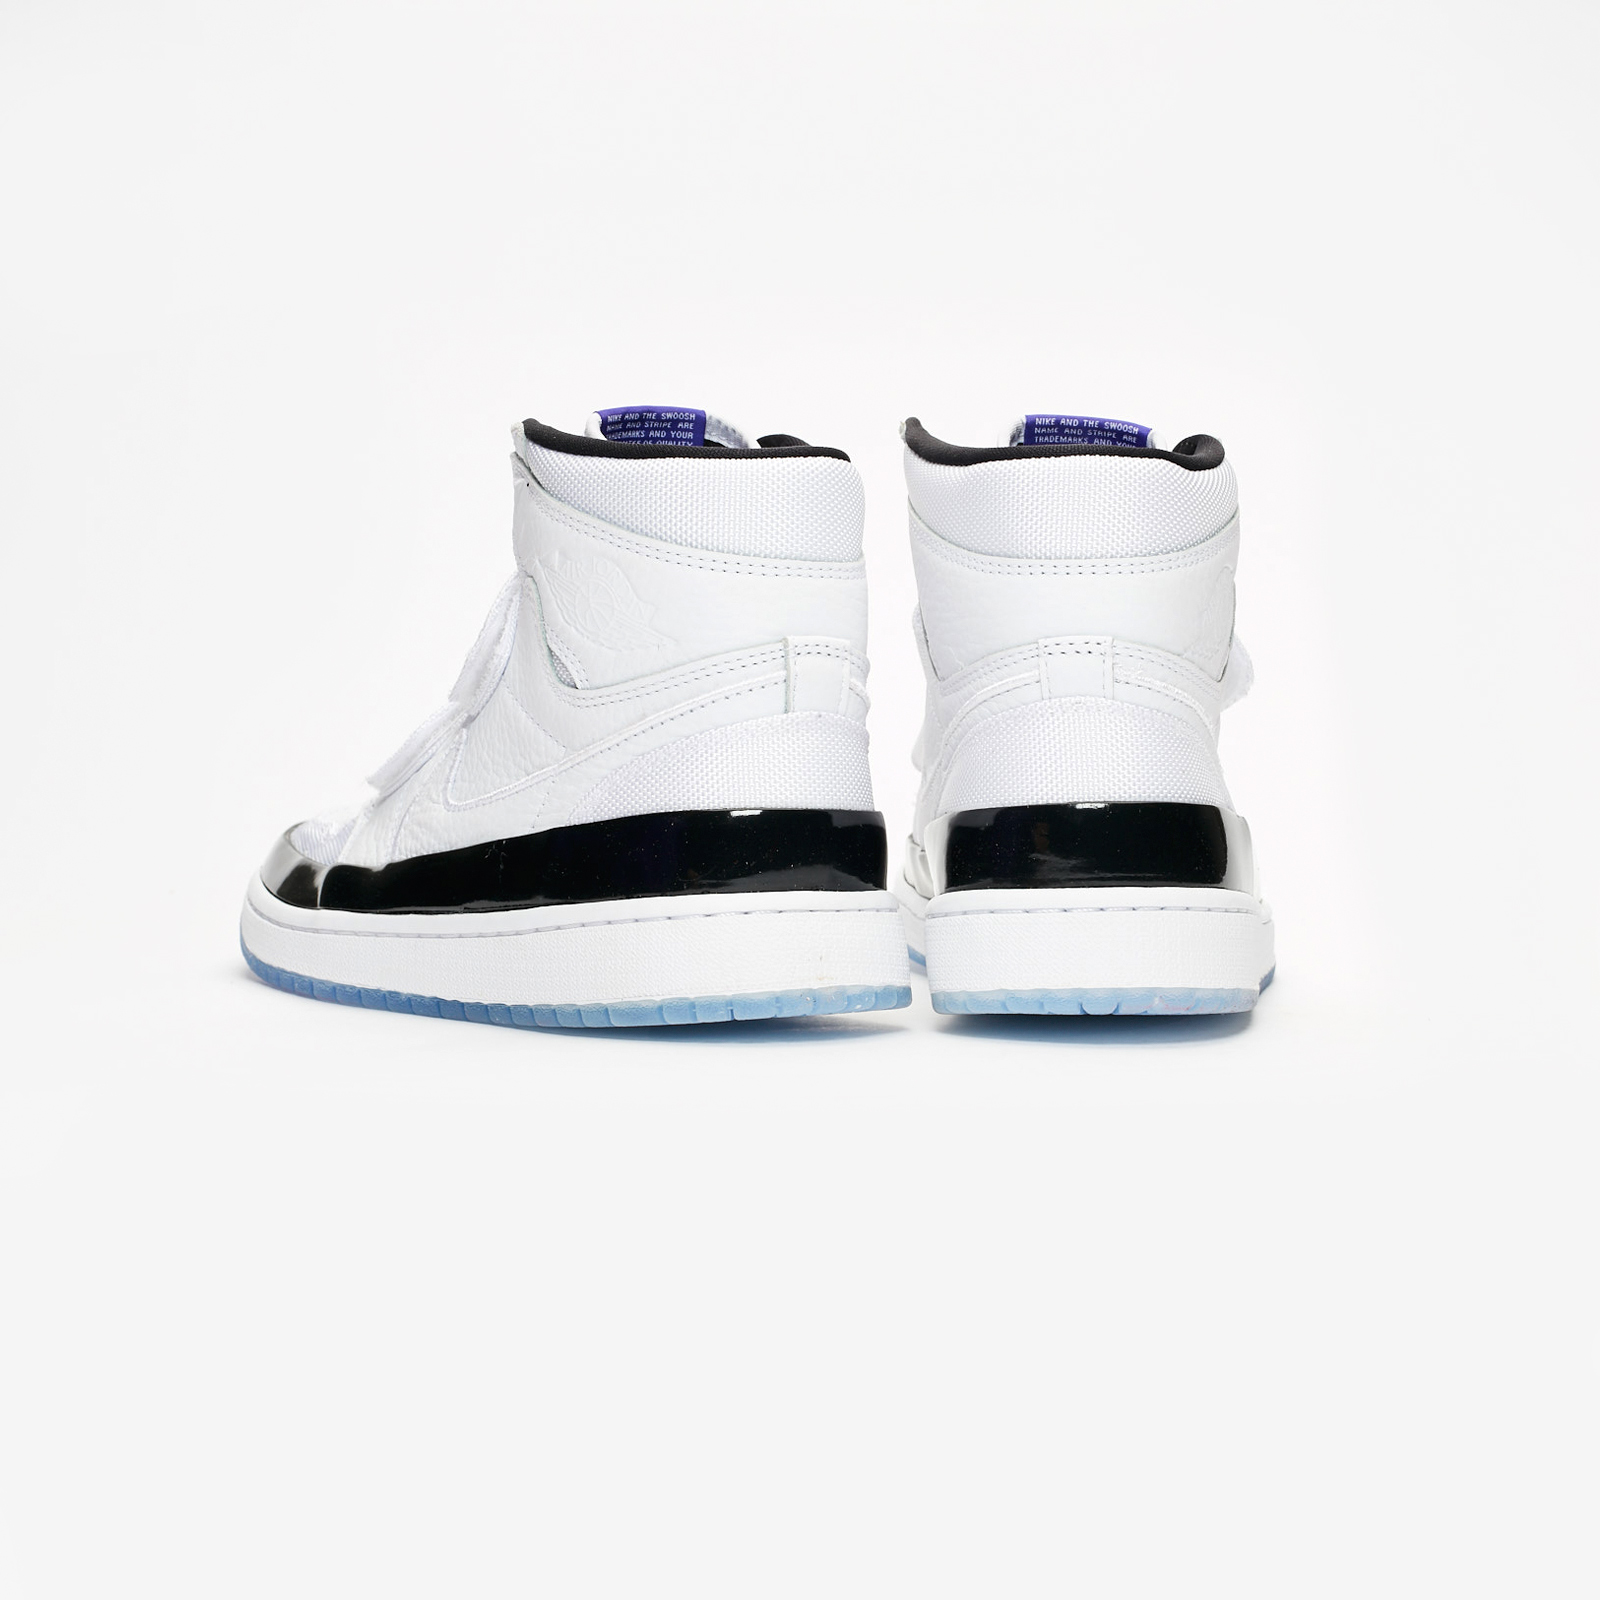 b2f06d4dd6b Jordan Brand Air Jordan 1 Retro High Double Strap - Aq7924-107 -  Sneakersnstuff | sneakers & streetwear online since 1999